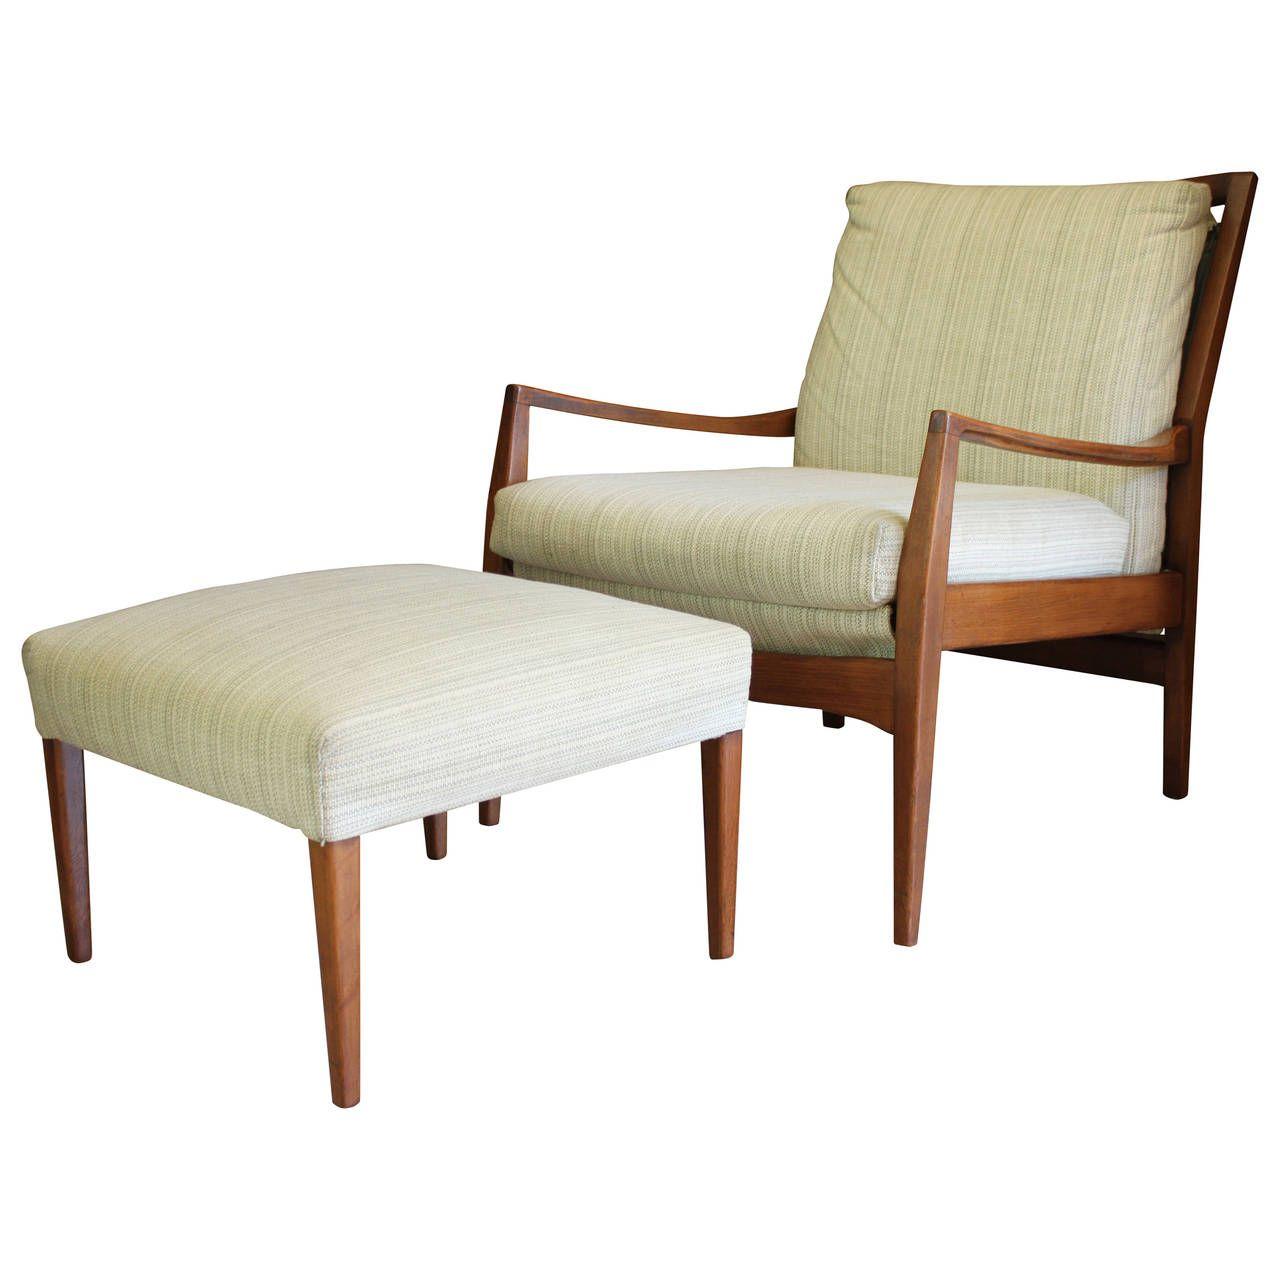 MidCentury Modern Danish Teak Lounge Chair and Ottoman